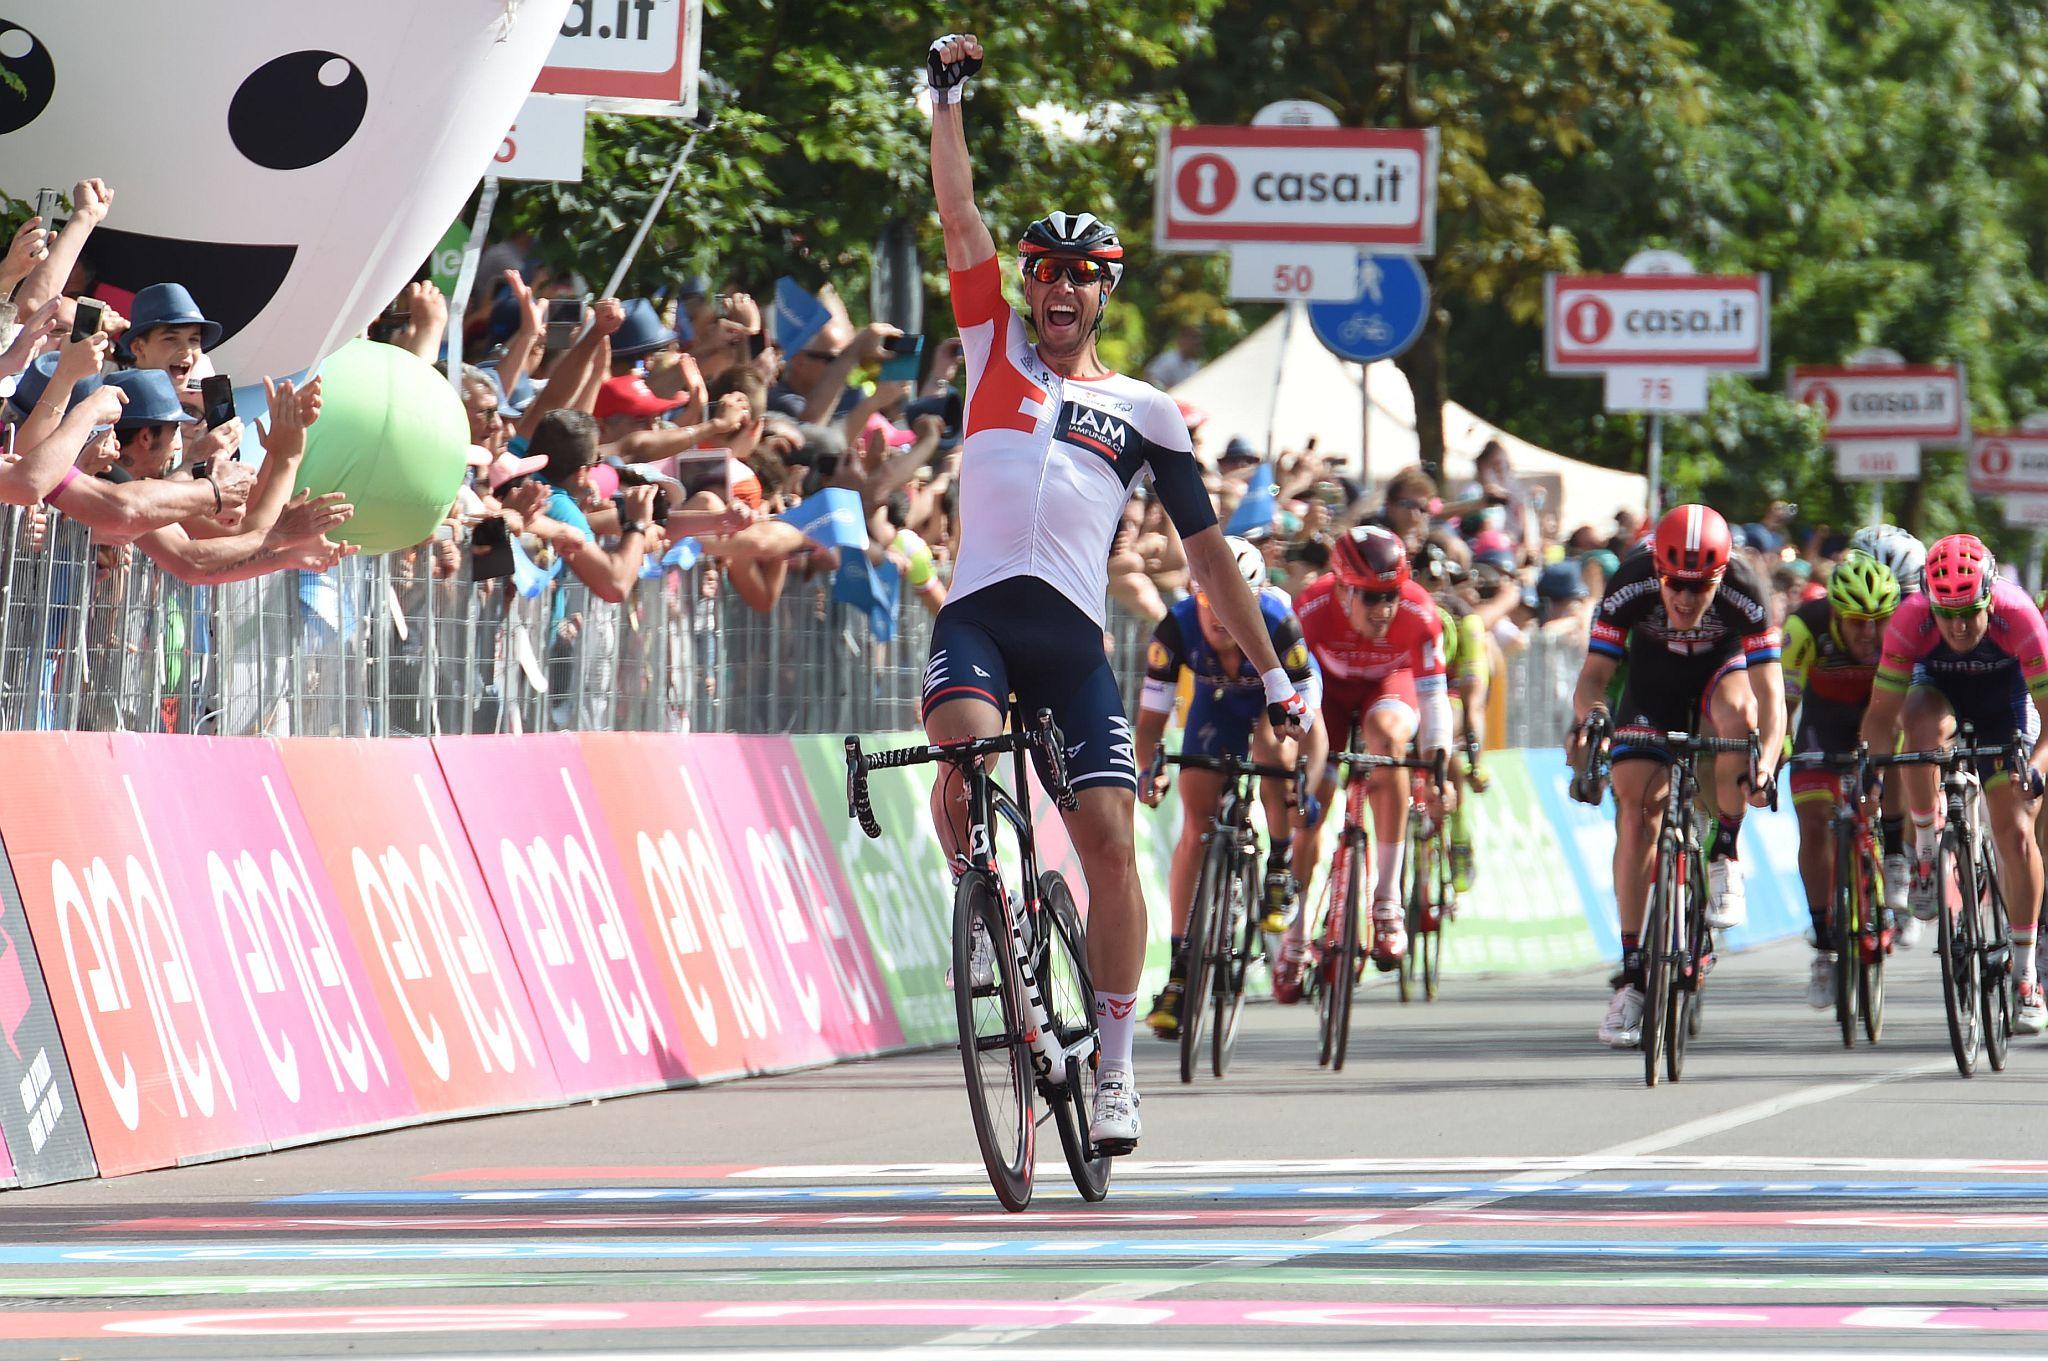 25-05-2016 Giro D'italia; Tappa 17 Molveno - Cassano D'adda; 2016, Iam Cycling; Kluge, Roger;